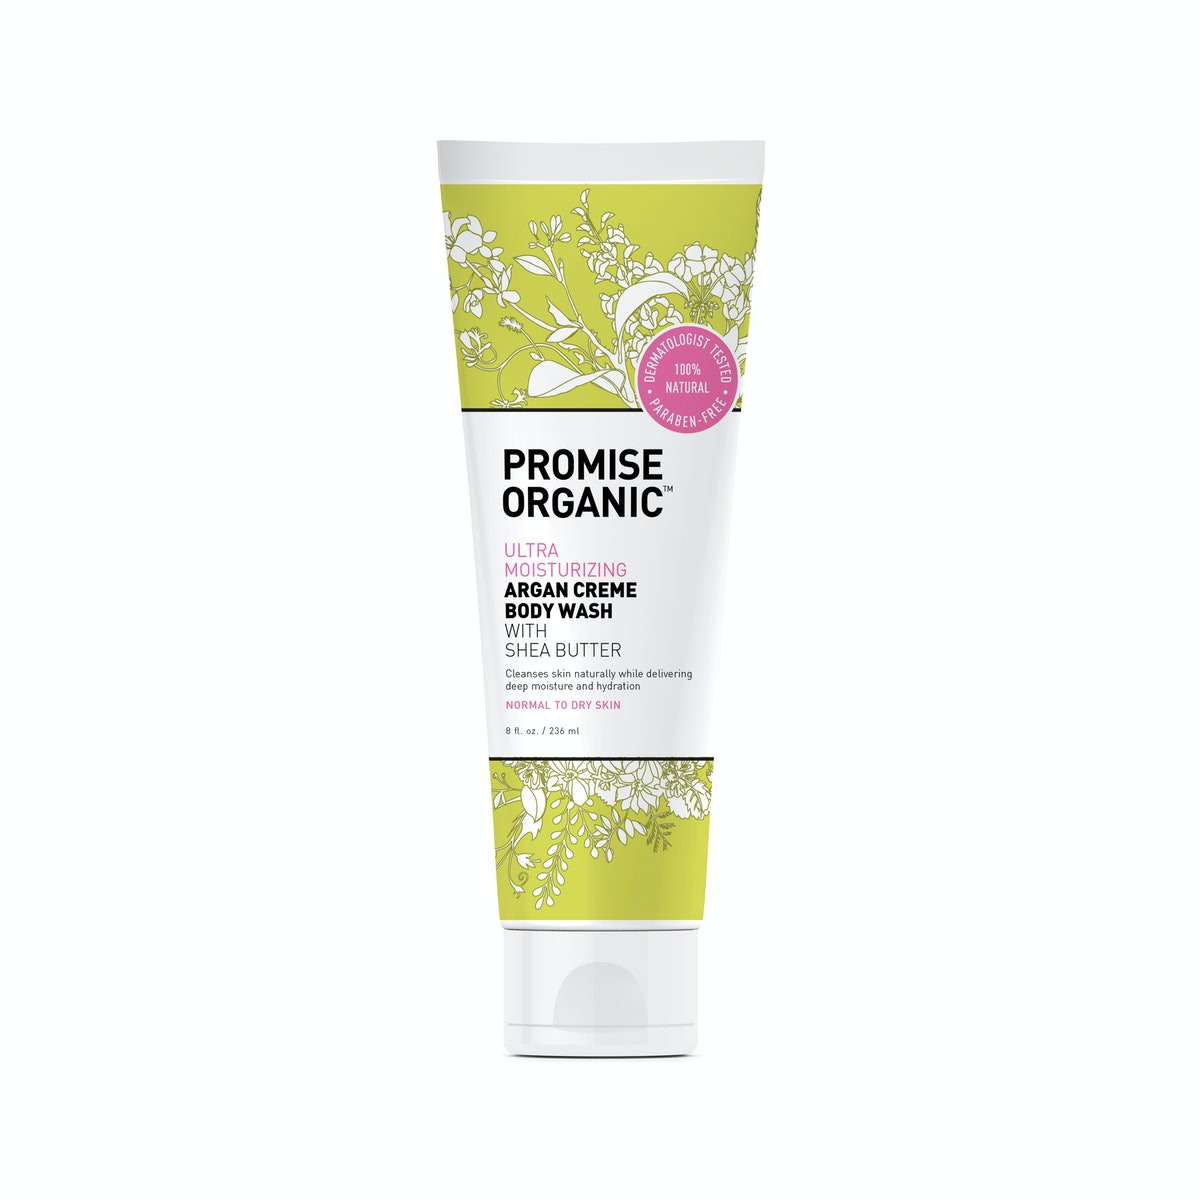 Promise Organic Ultra-Moisturizing Argan Crème Body Wash